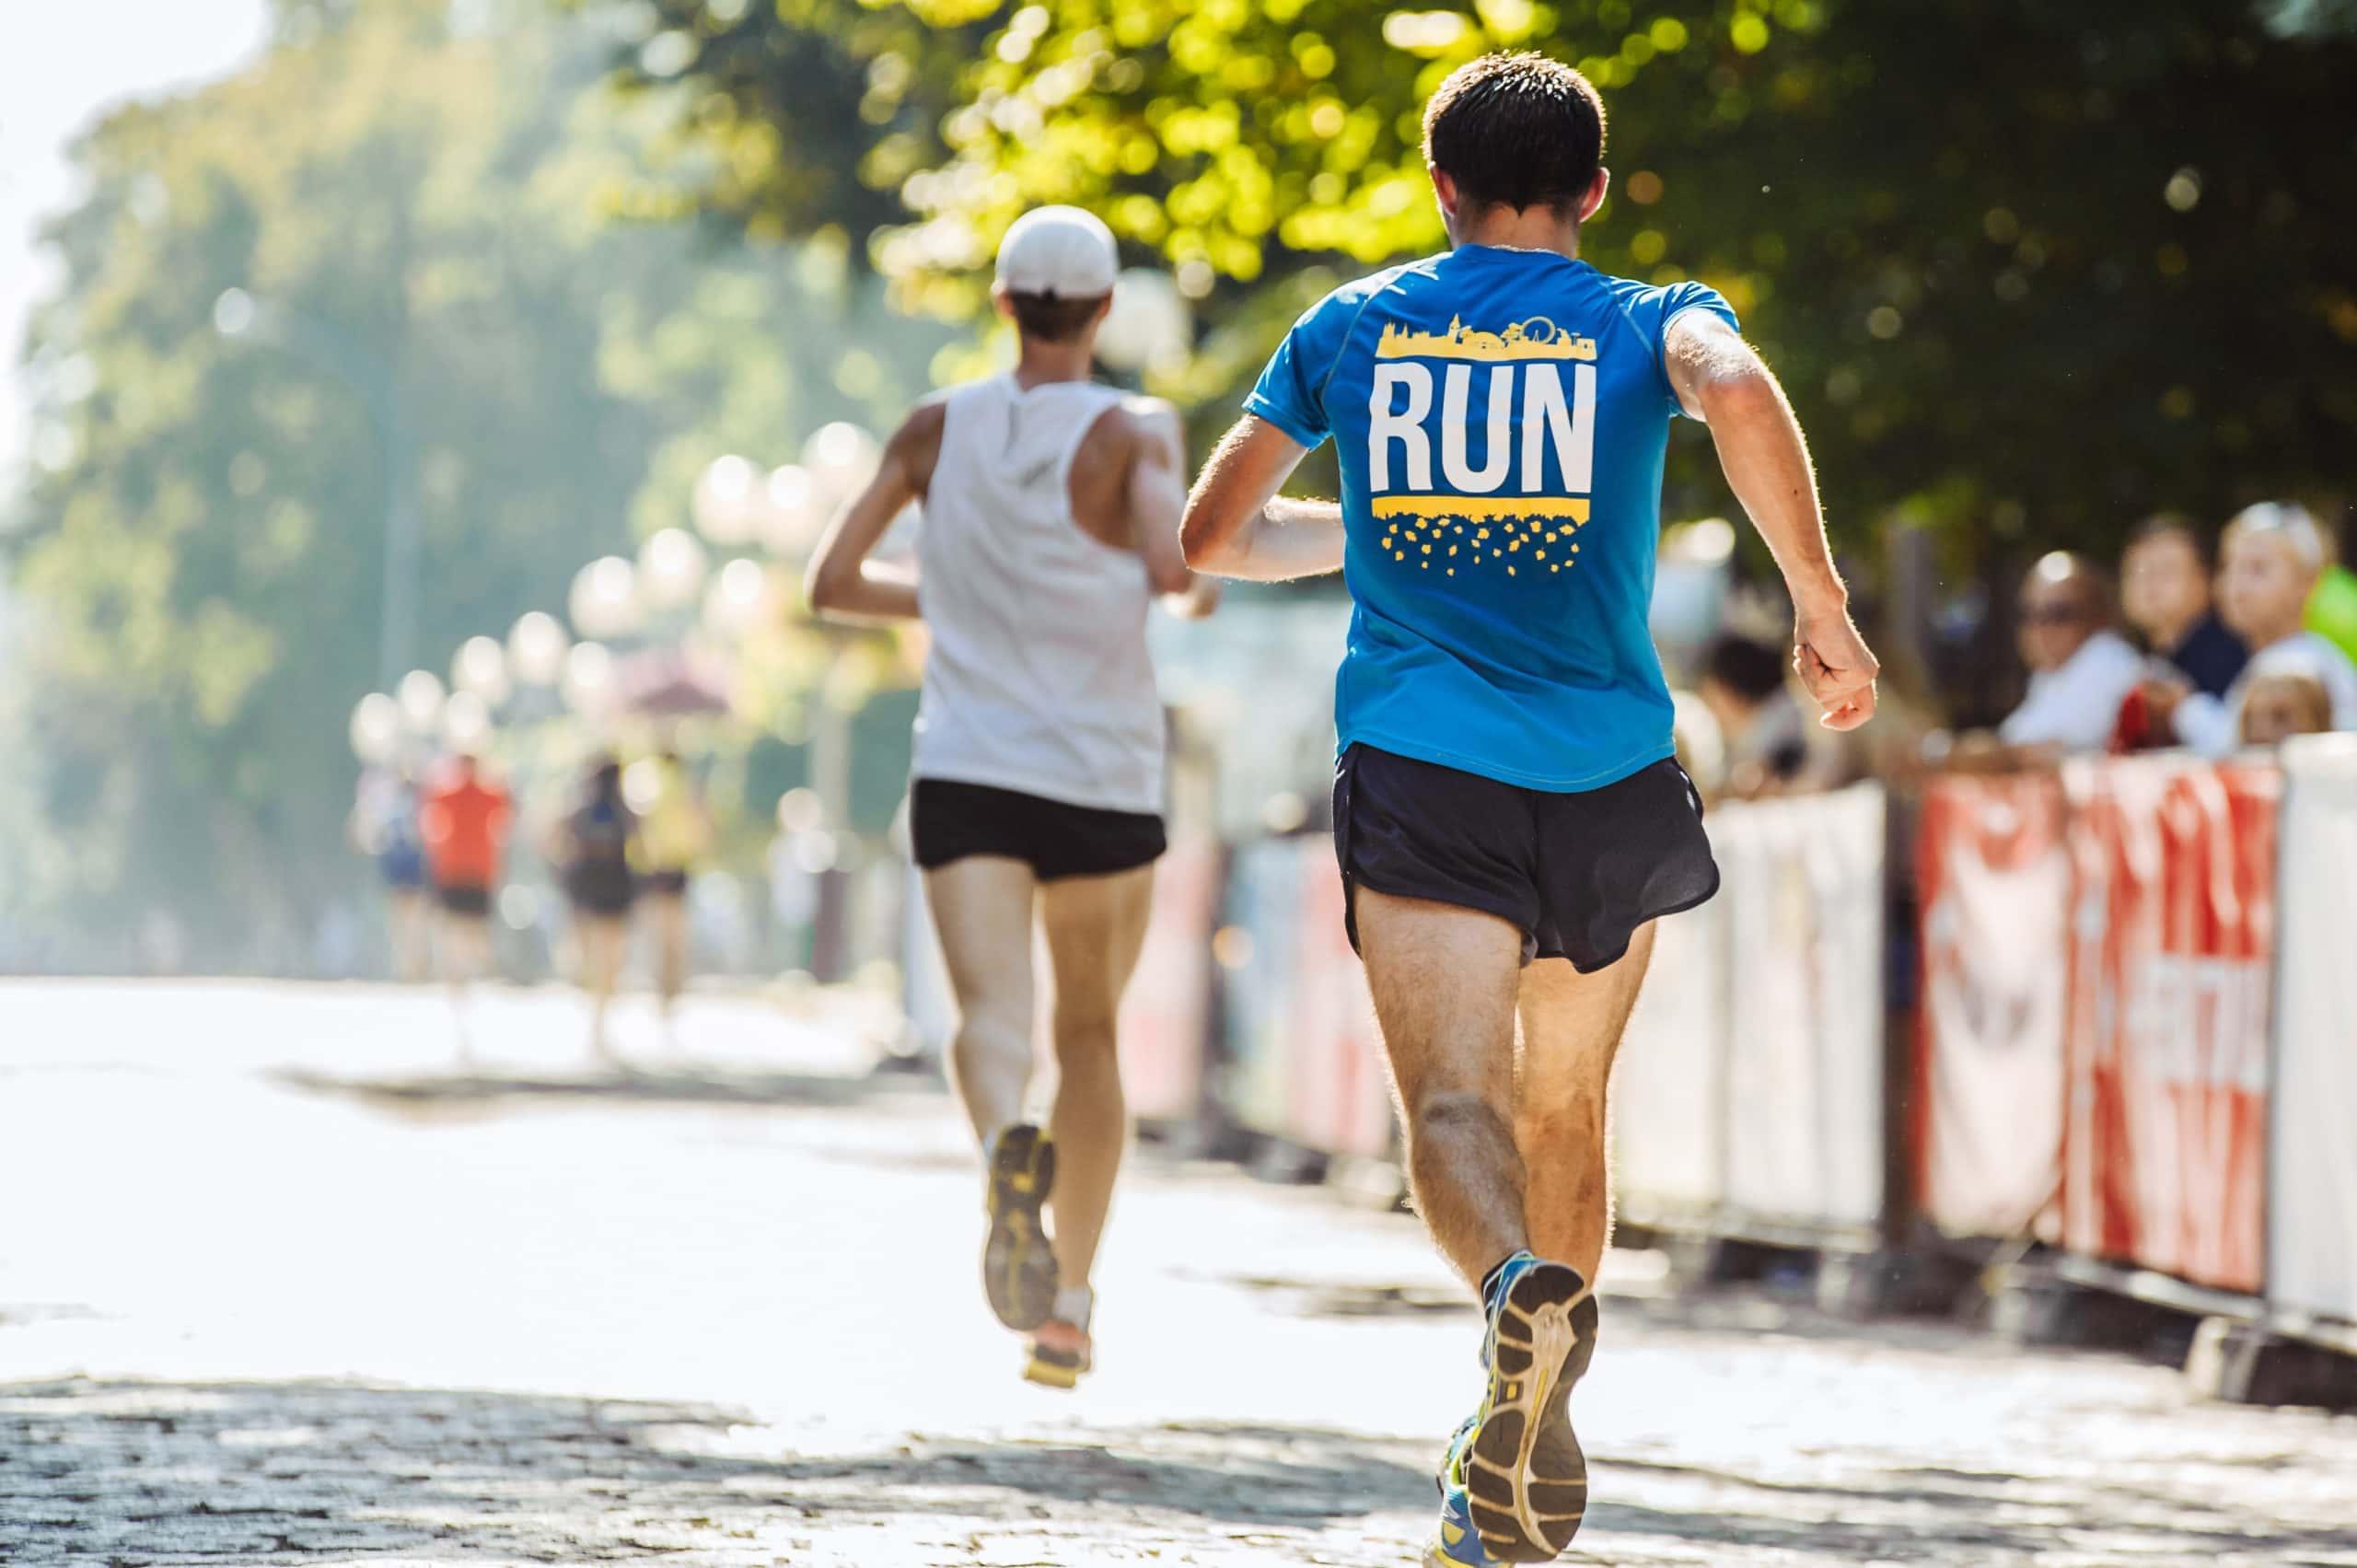 IV Hydration at Joplin Memorial Run